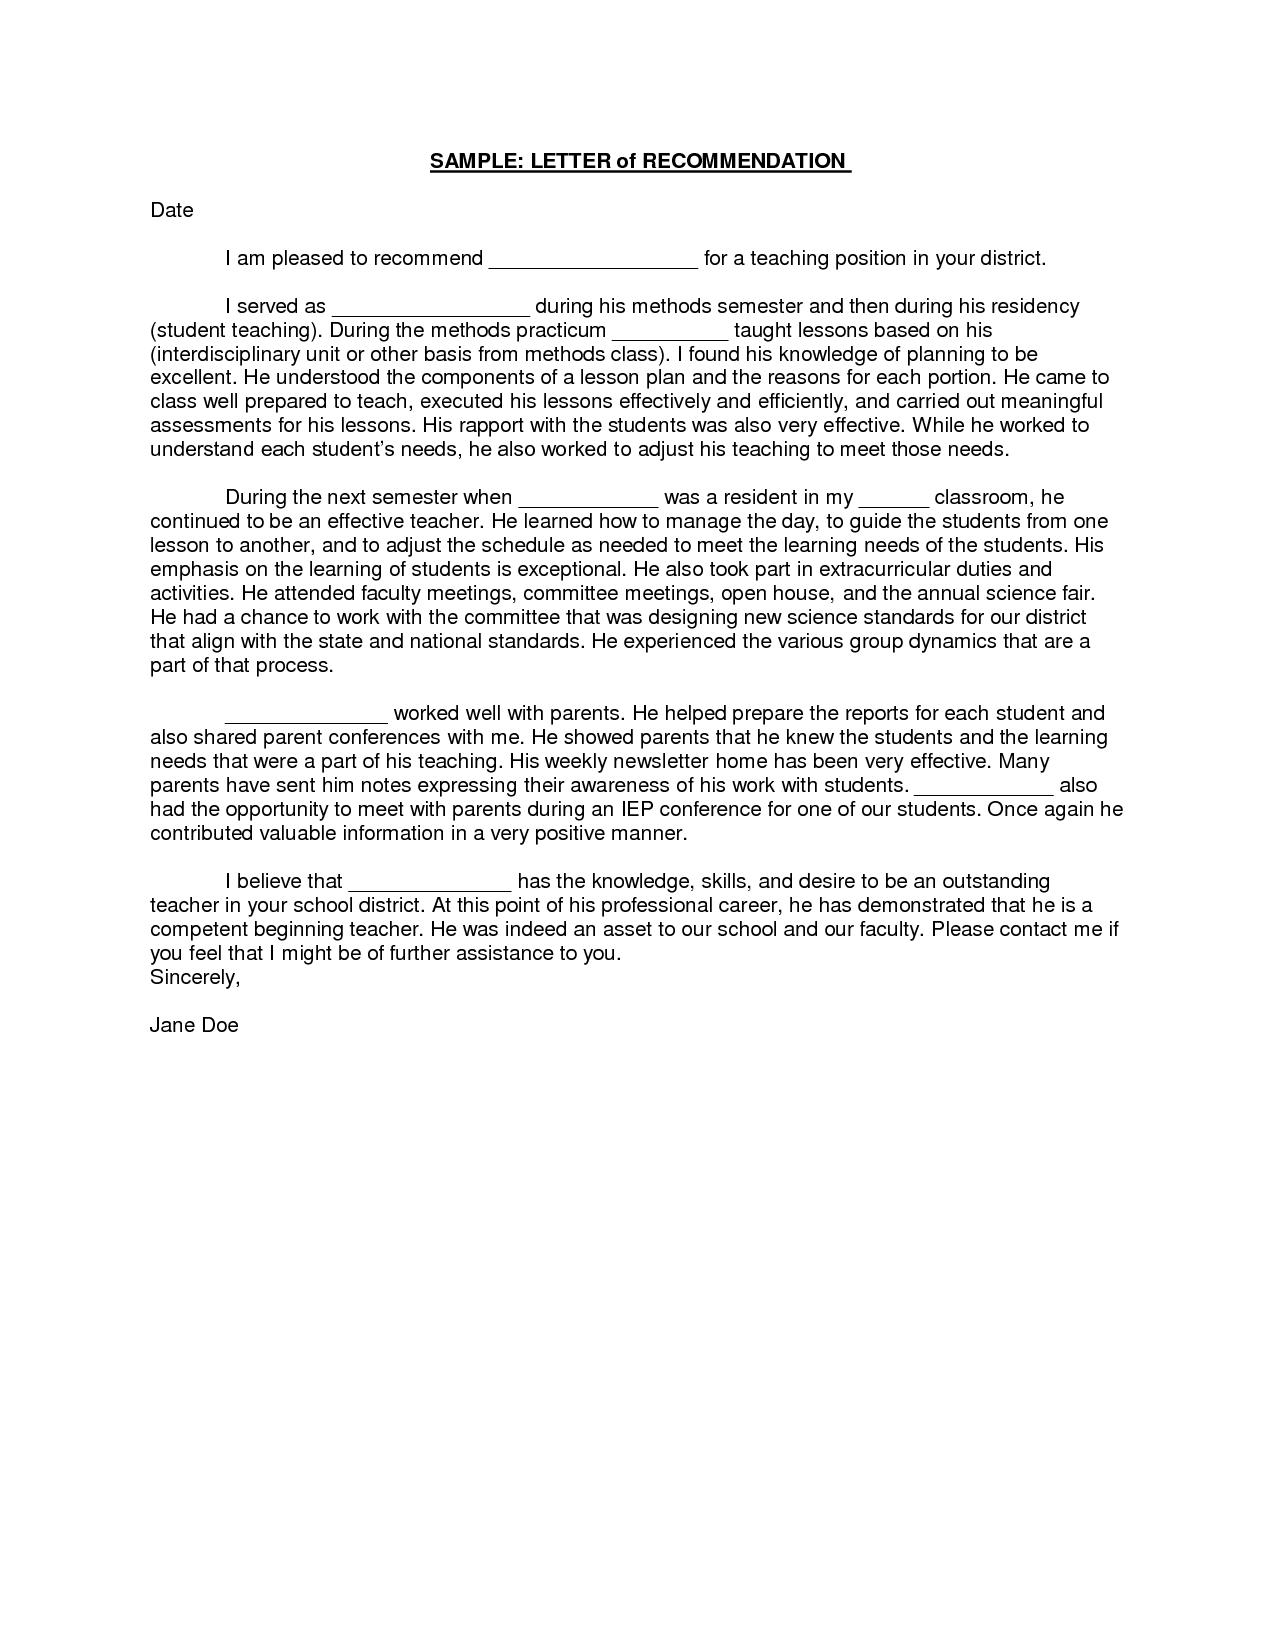 Teacher Recommendation Letter A Letter Of Recommendation